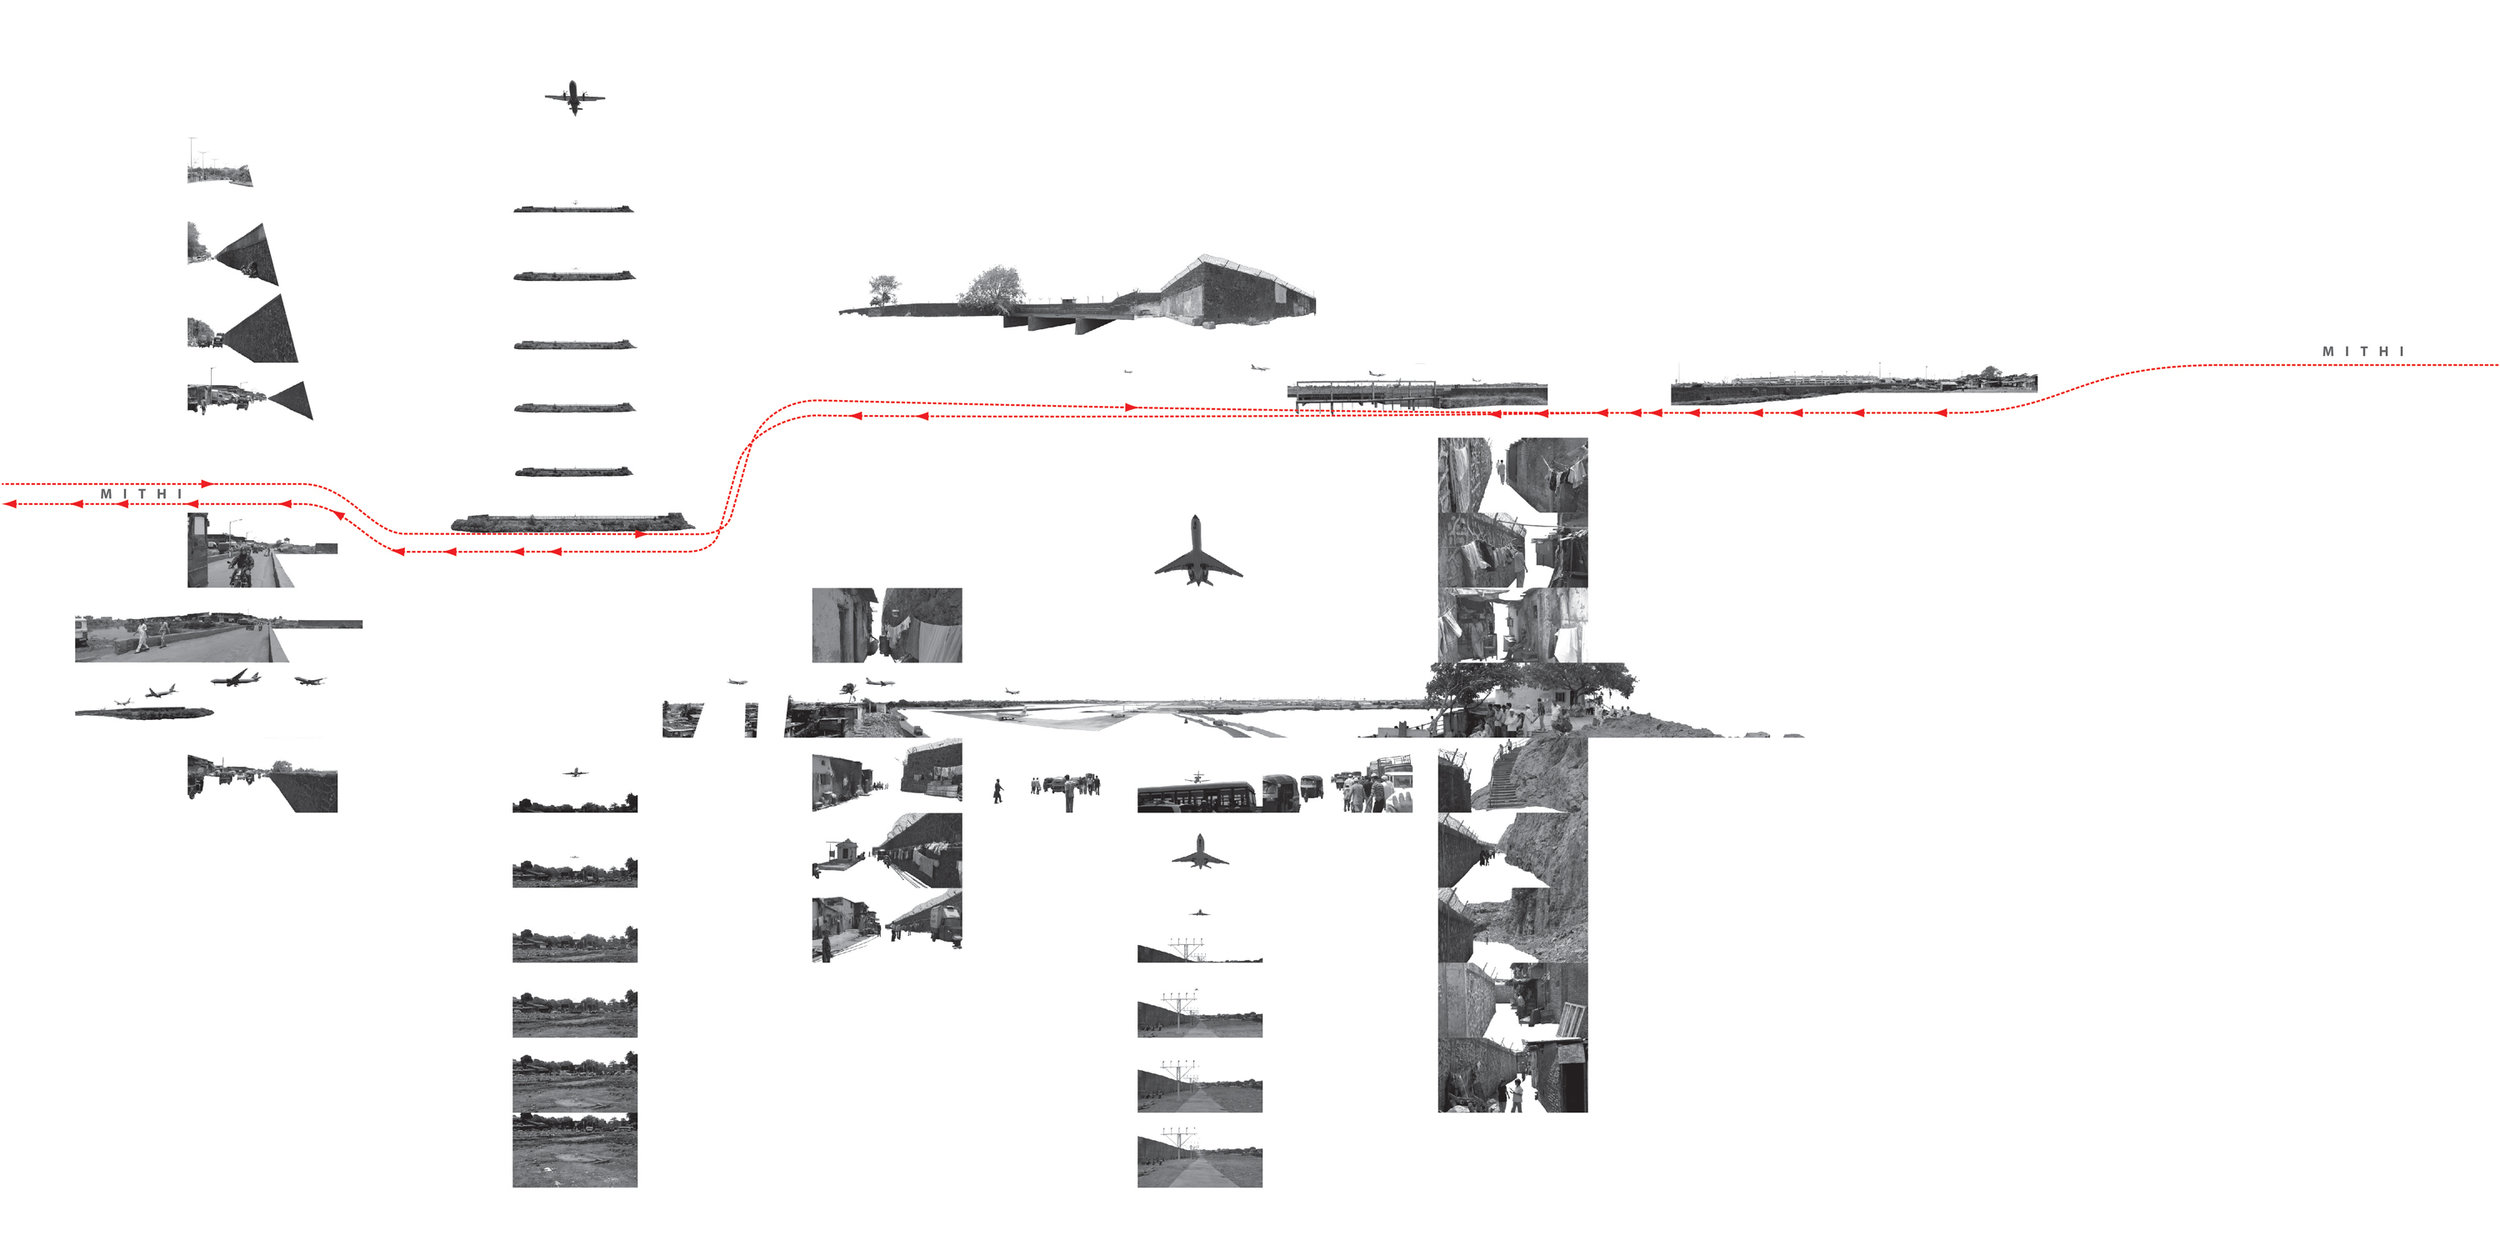 5_airport-crossing-diagram-photowork_1m.jpg